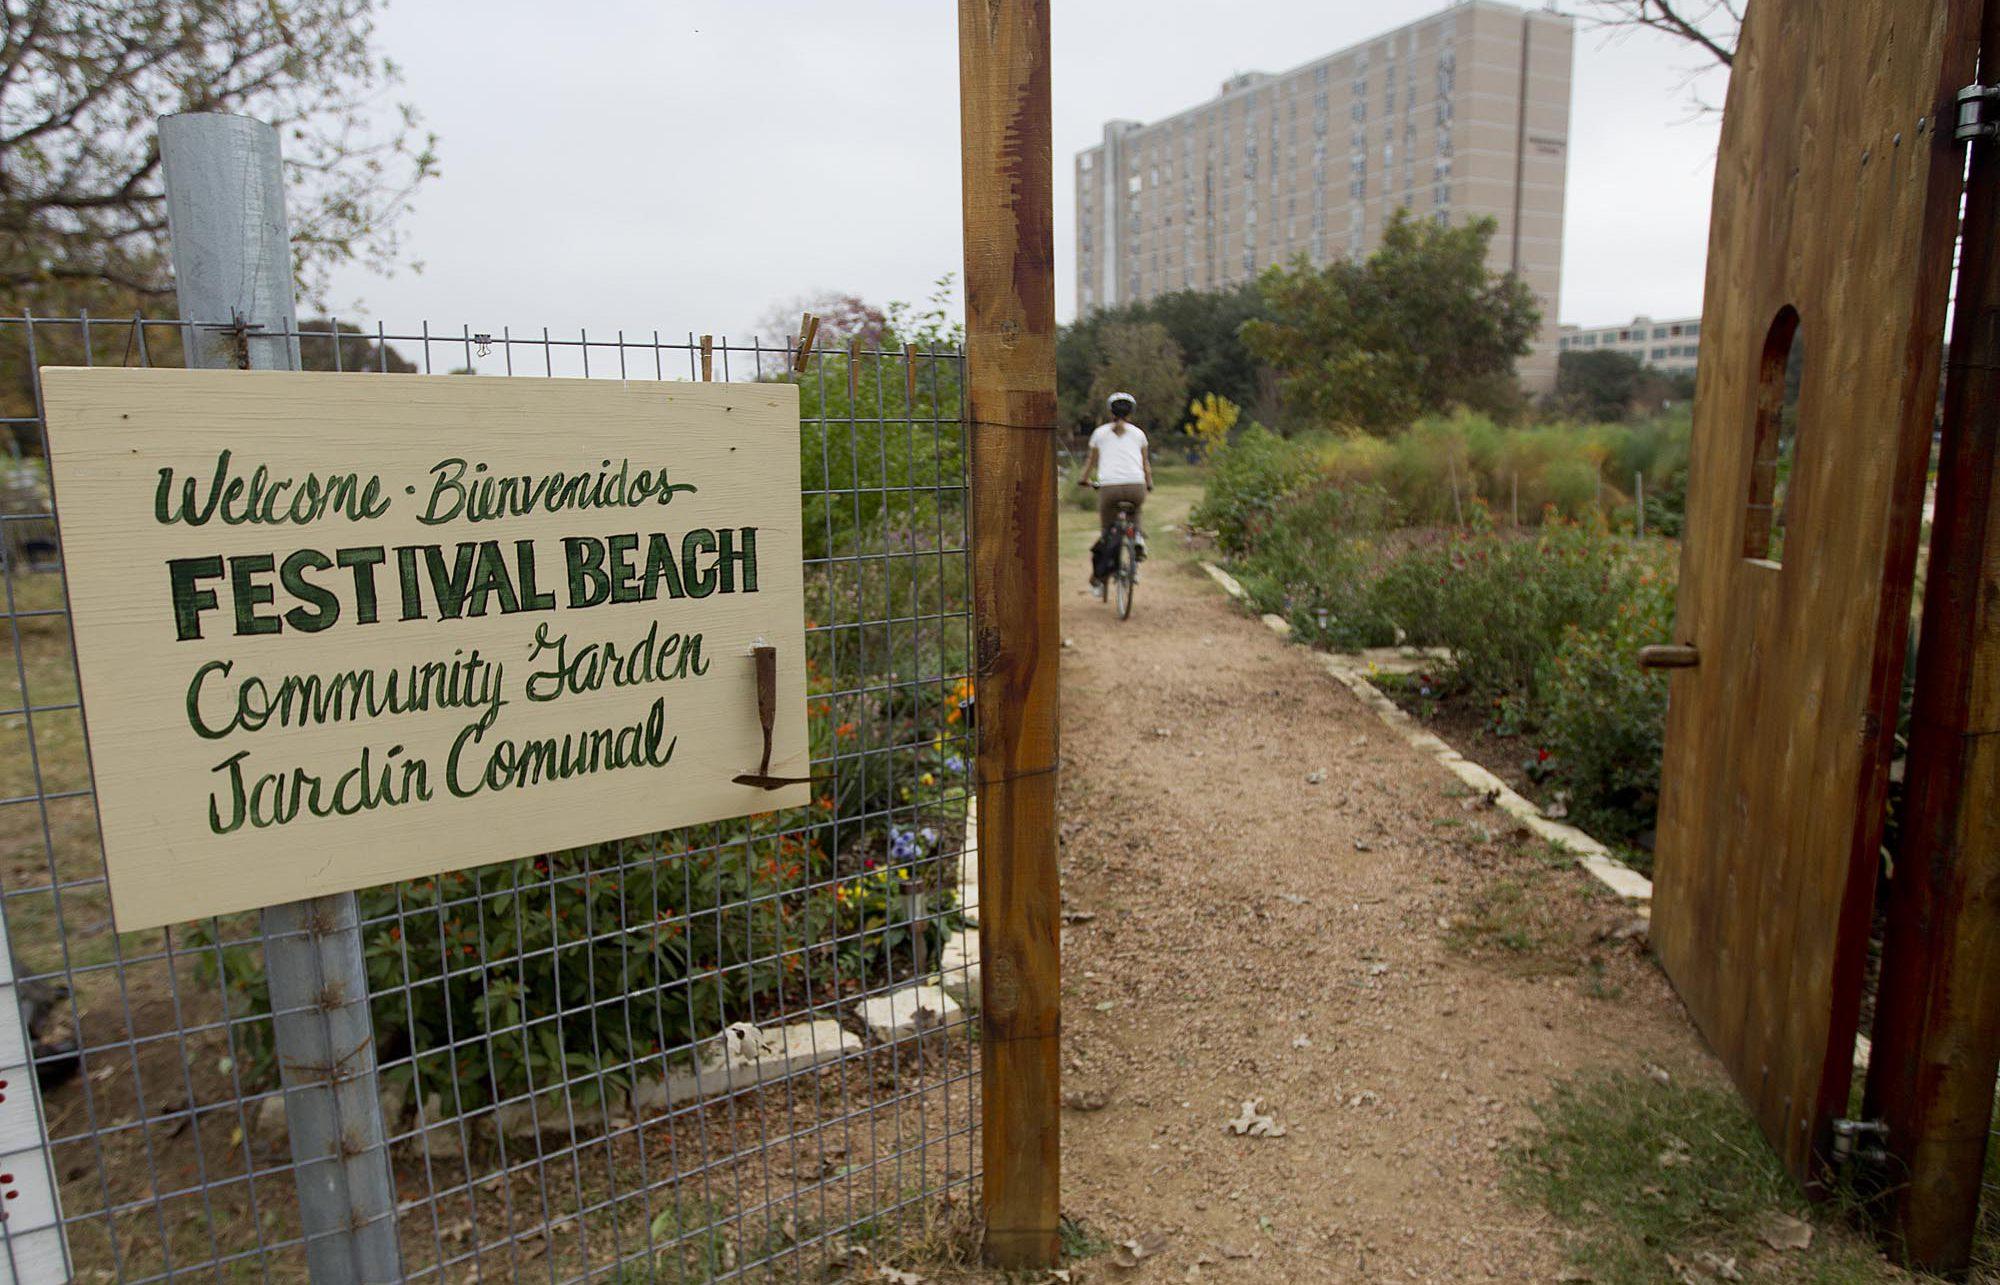 Festival Beach Community Garden – Coalition of Austin Community Gardens